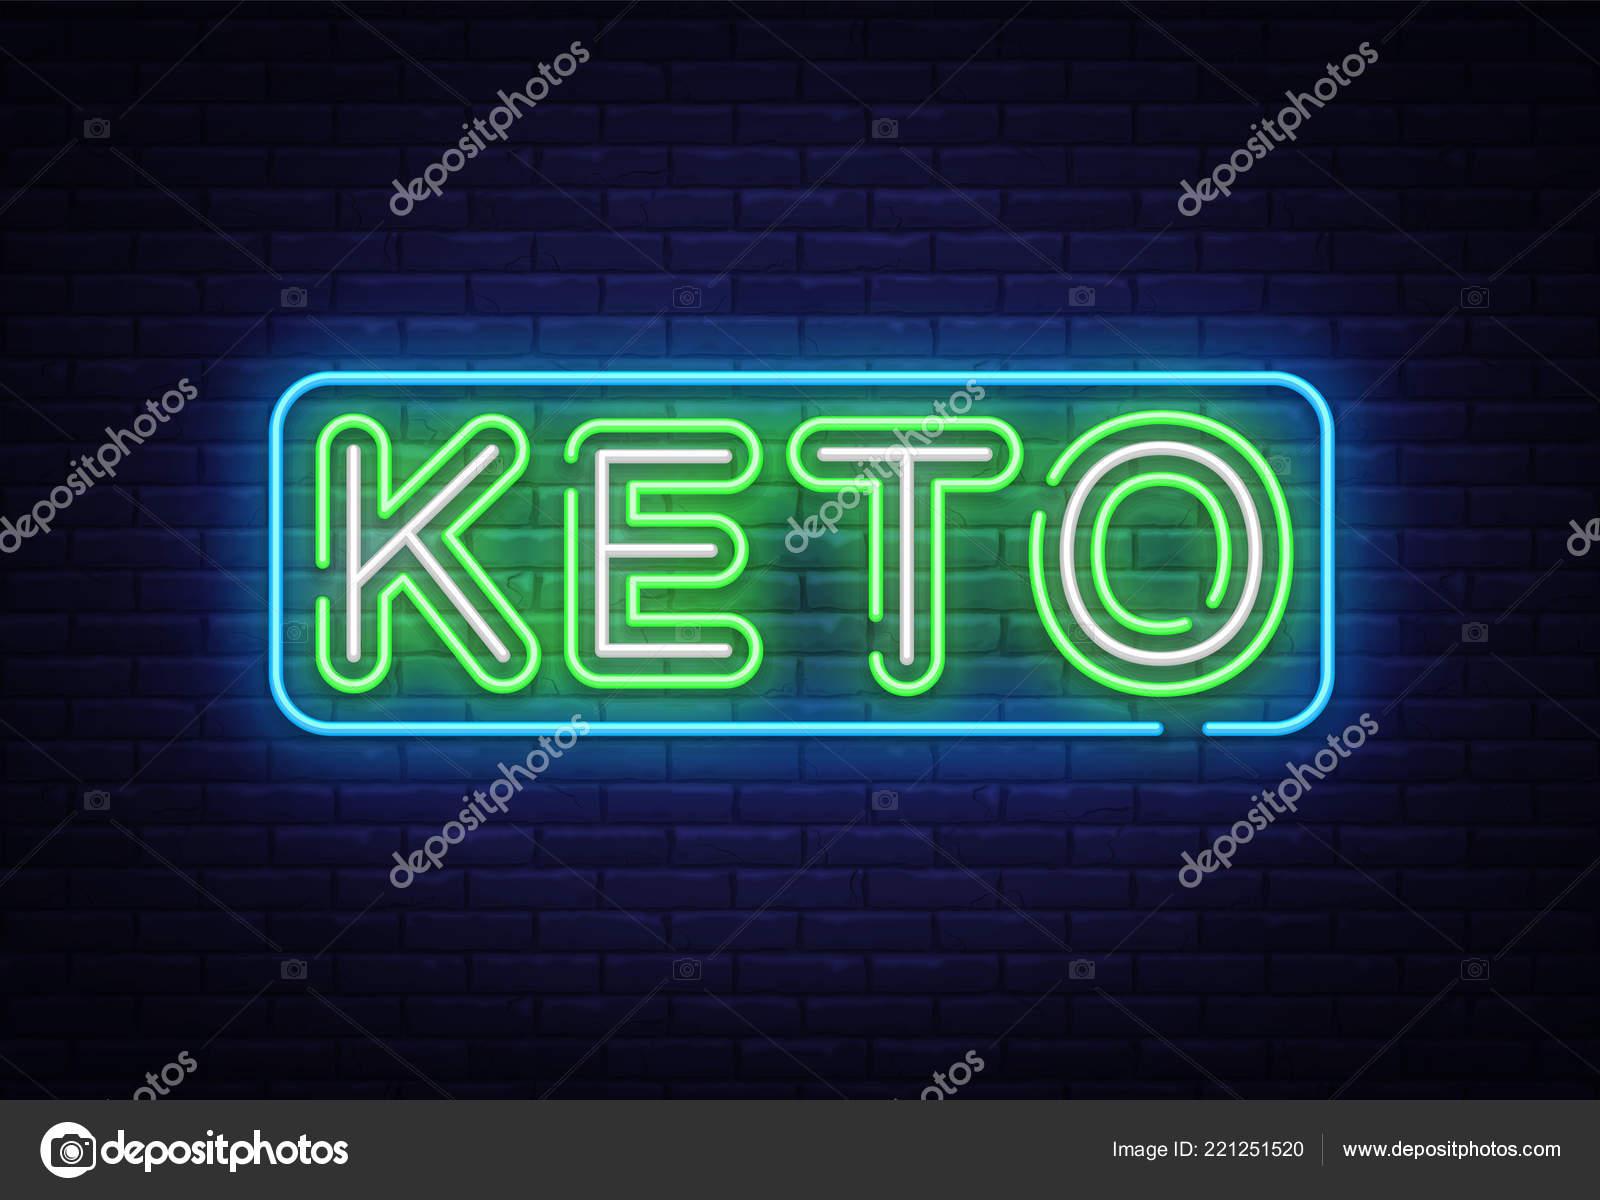 Vektor Keto Diat Leuchtreklame Ketogene Diat Design Vorlage Neon